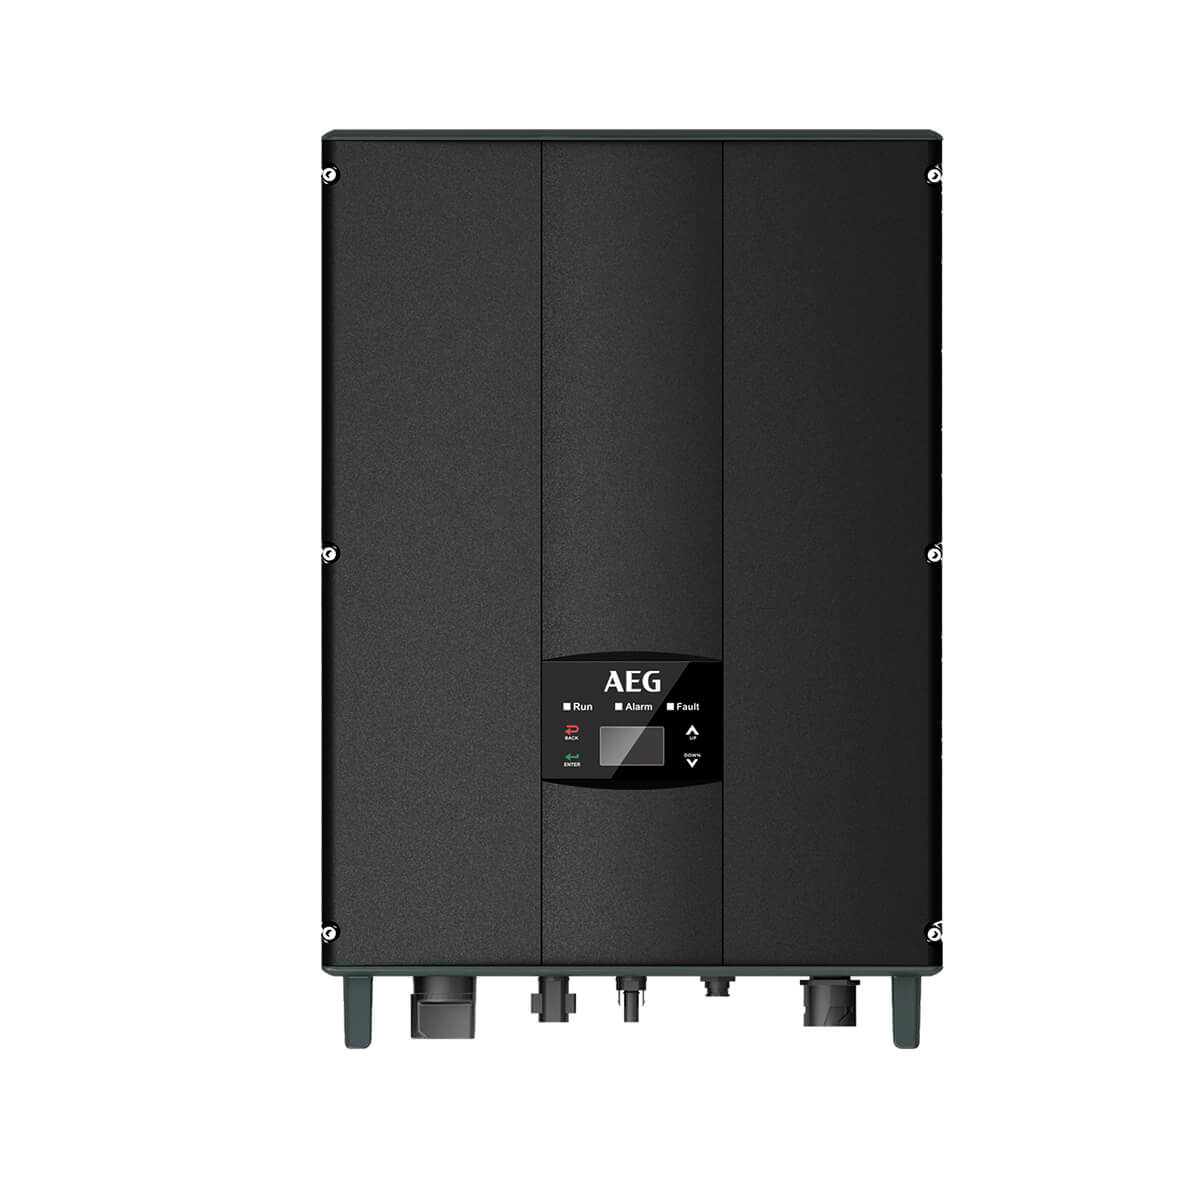 aeg 8kW inverter, aeg as-ic01 8kW inverter, aeg as-ic01-8000-2 inverter, aeg as-ic01-8000-2, aeg as-ic01 8kW